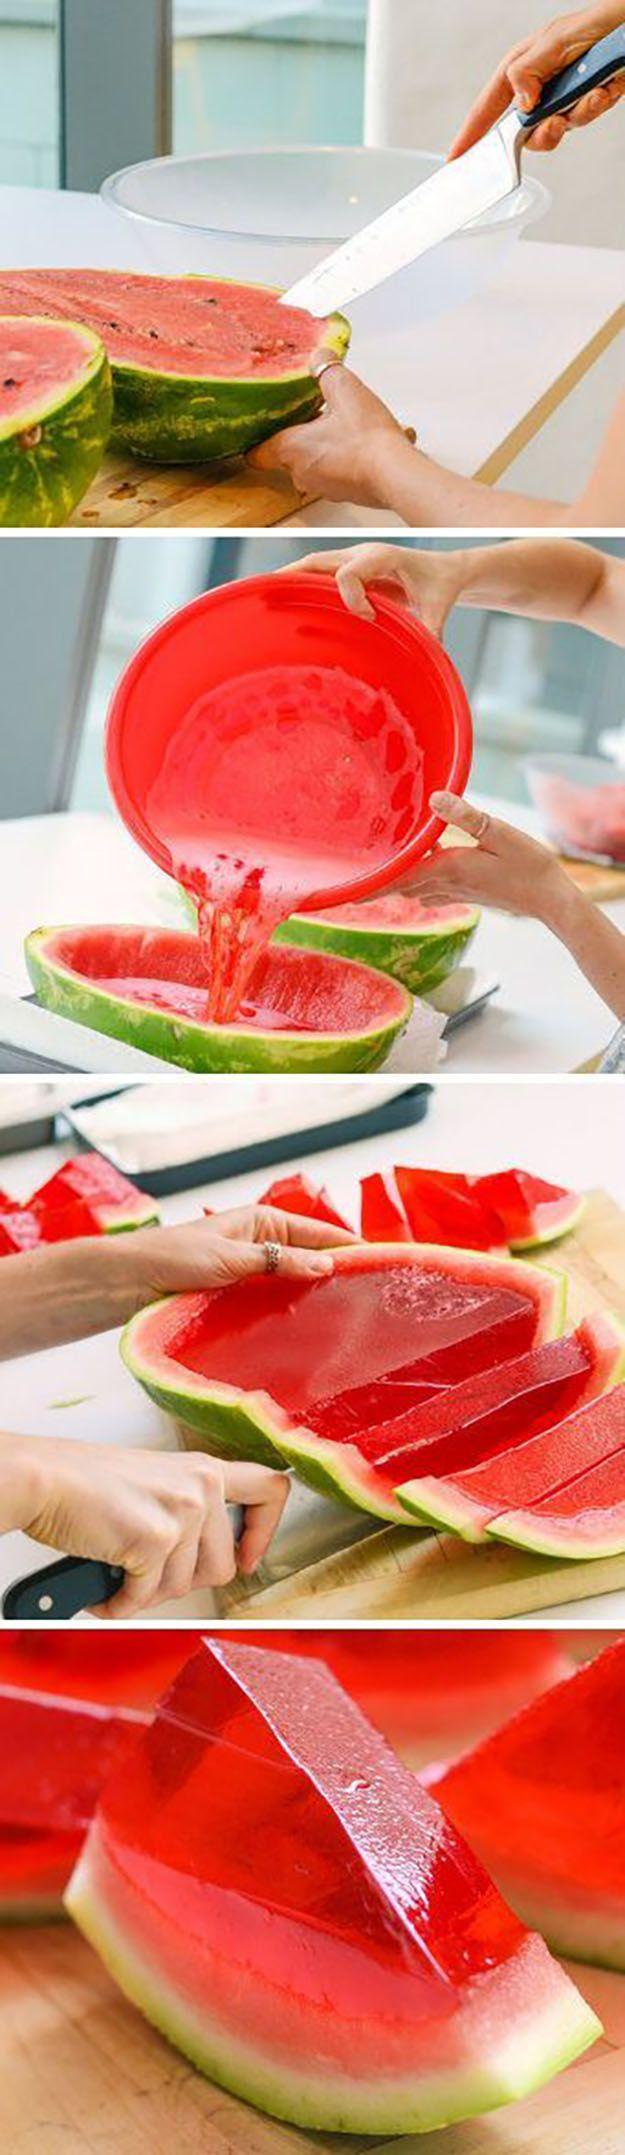 Easy Party Food Ideas | Make Ahead Cocktails | Watermelon Jello Shot Recipe | DIY Projects & Crafts by DIY JOY at diyjoy.com/...